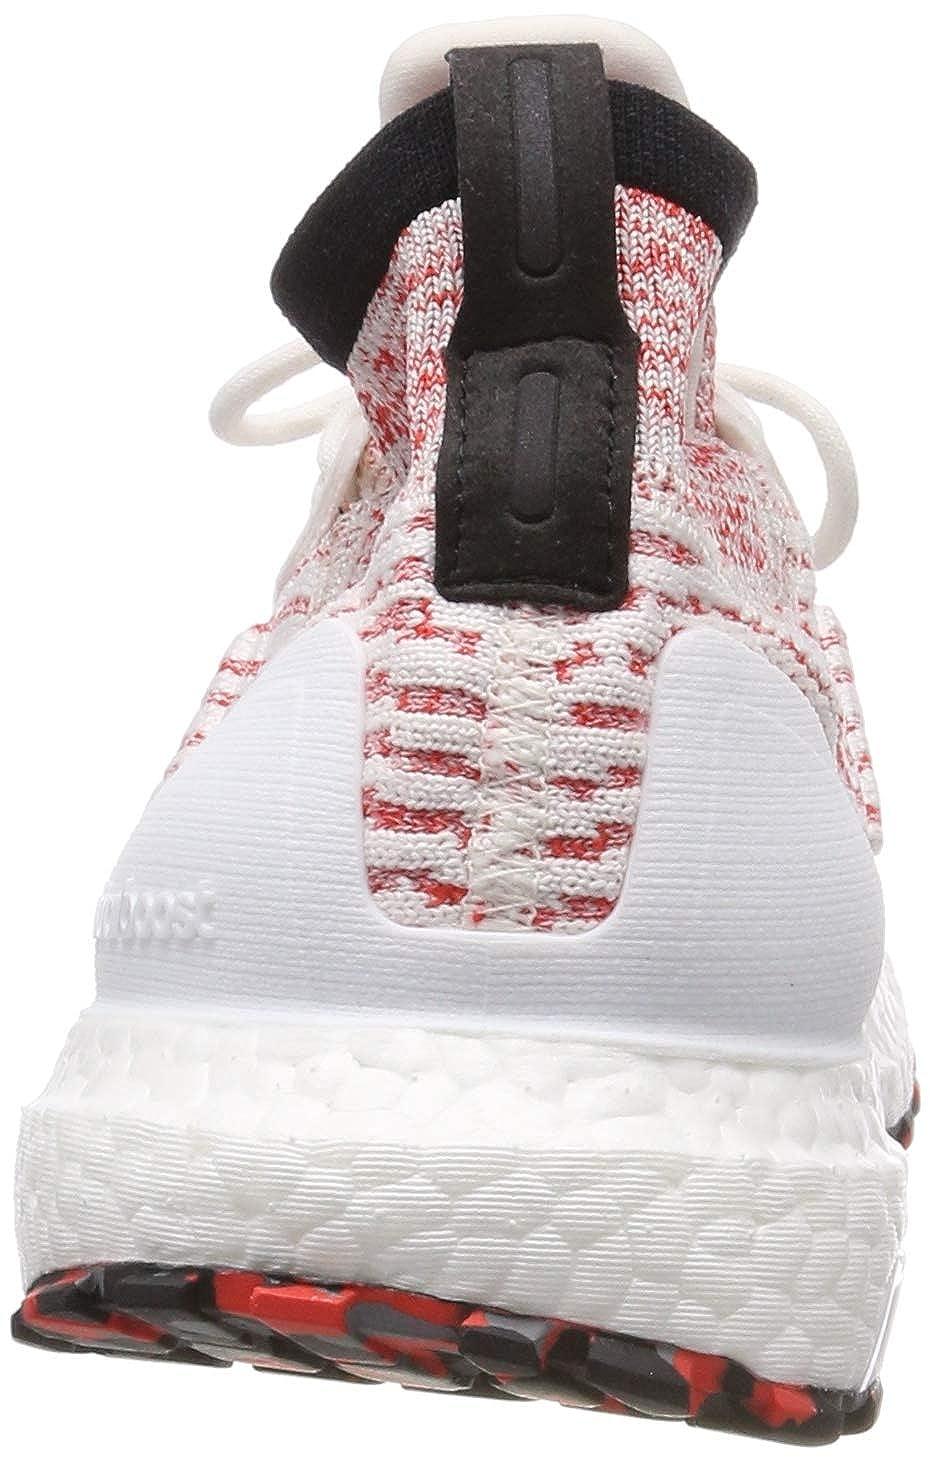 Adidas Adidas Adidas Herren Ultraboost All Terrain Laufschuhe B07JY37YMX  3a799c